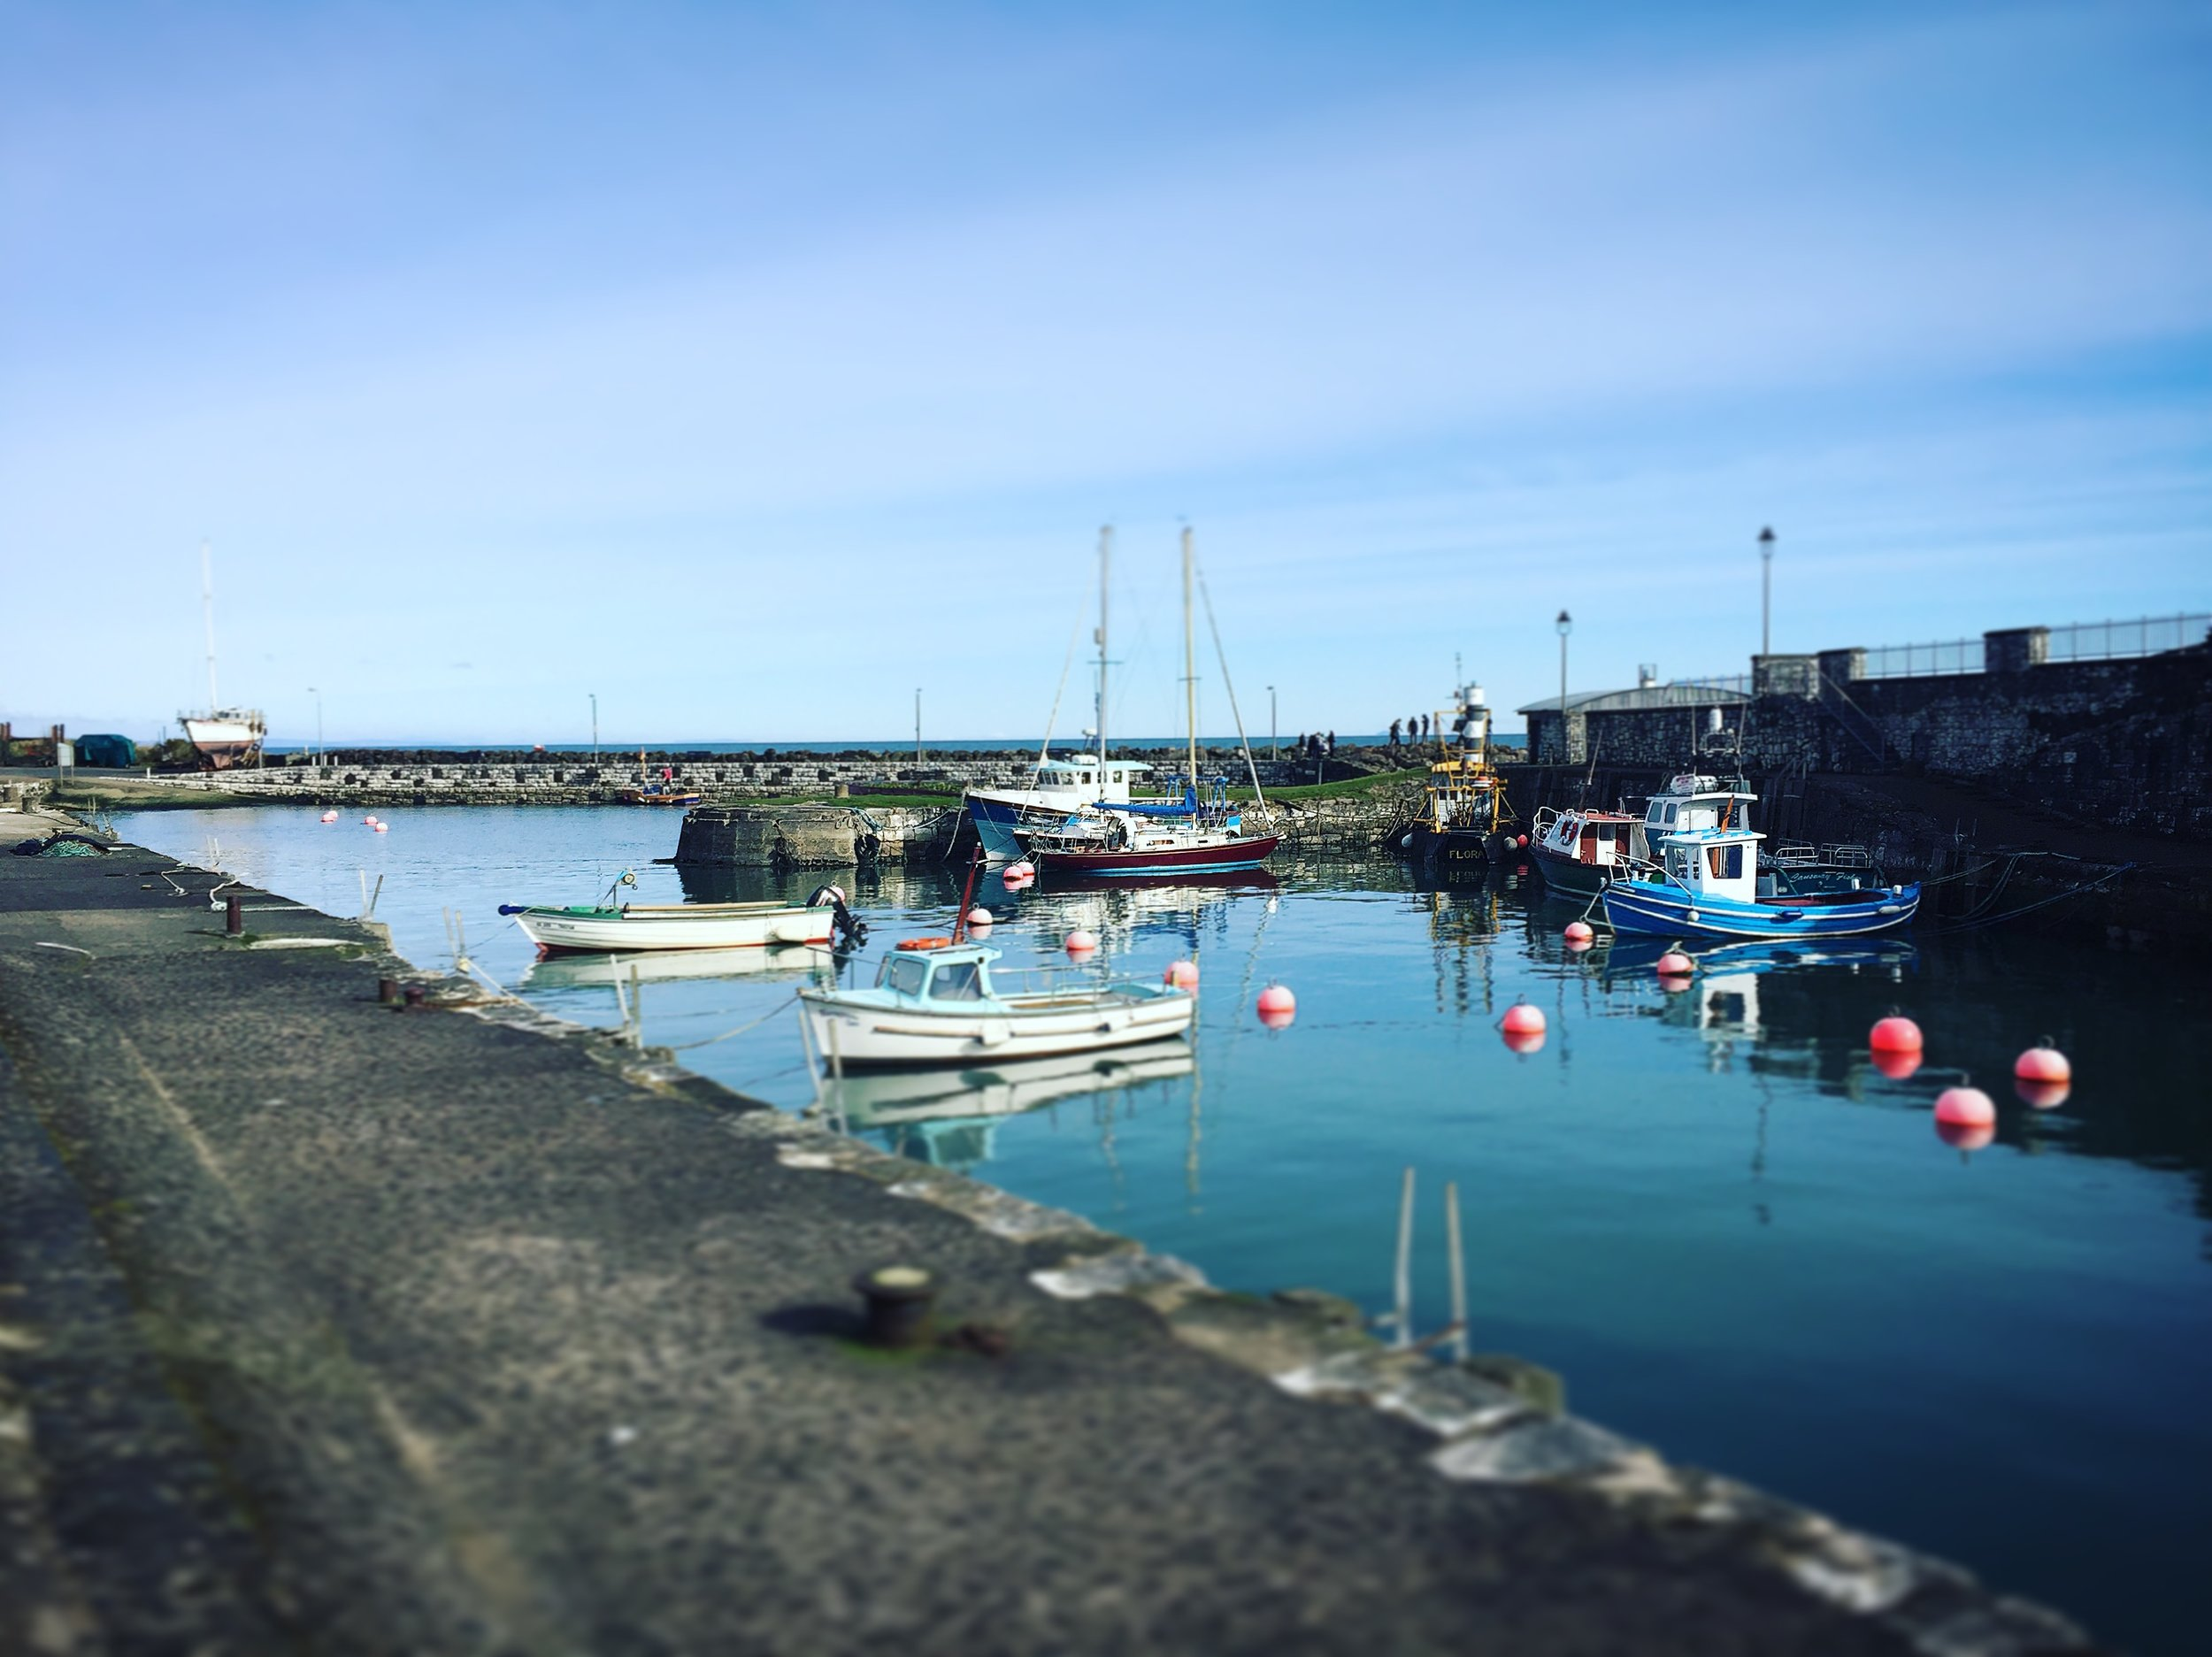 harbour_boats_carnlough_Waterfoot__forest_glenariff_glenoe_glenarm_glens_antrim_ni_explorer_niexplorer_northern_ireland_blog.jpg